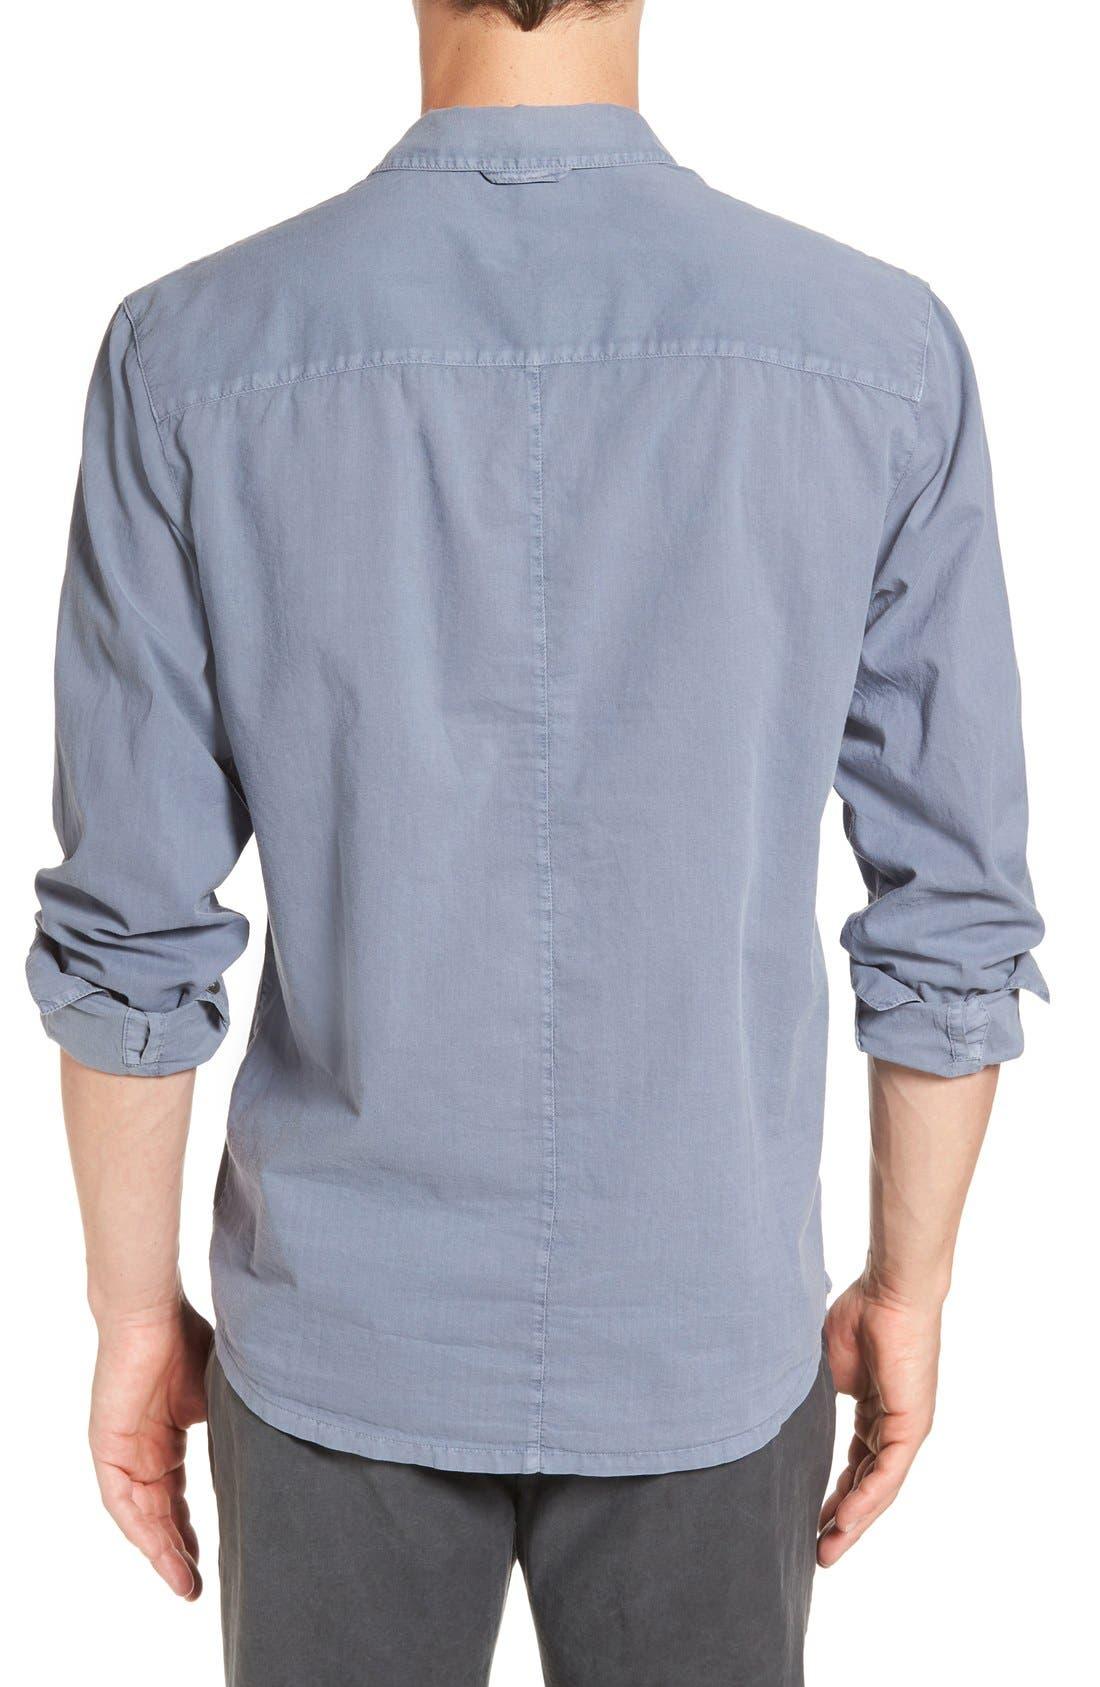 Alternate Image 2  - James Perse 'Classics' Cotton Lawn Shirt